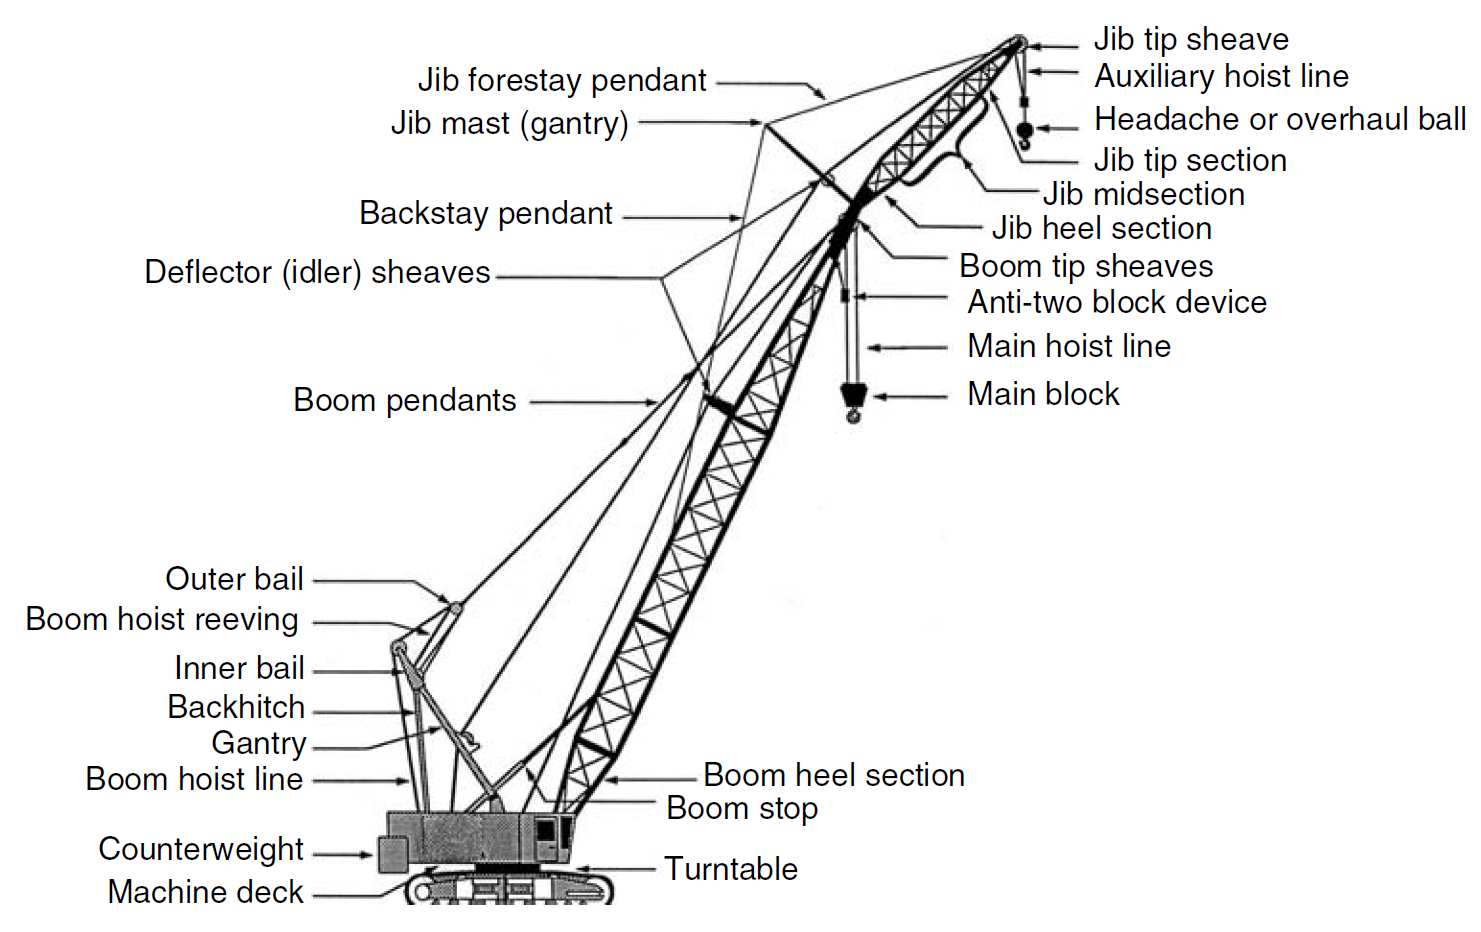 medium resolution of lattice boom crawler cranes engineersdaily free engineering database lattice boom crawler crane diagram lattice boom crawler crane diagram